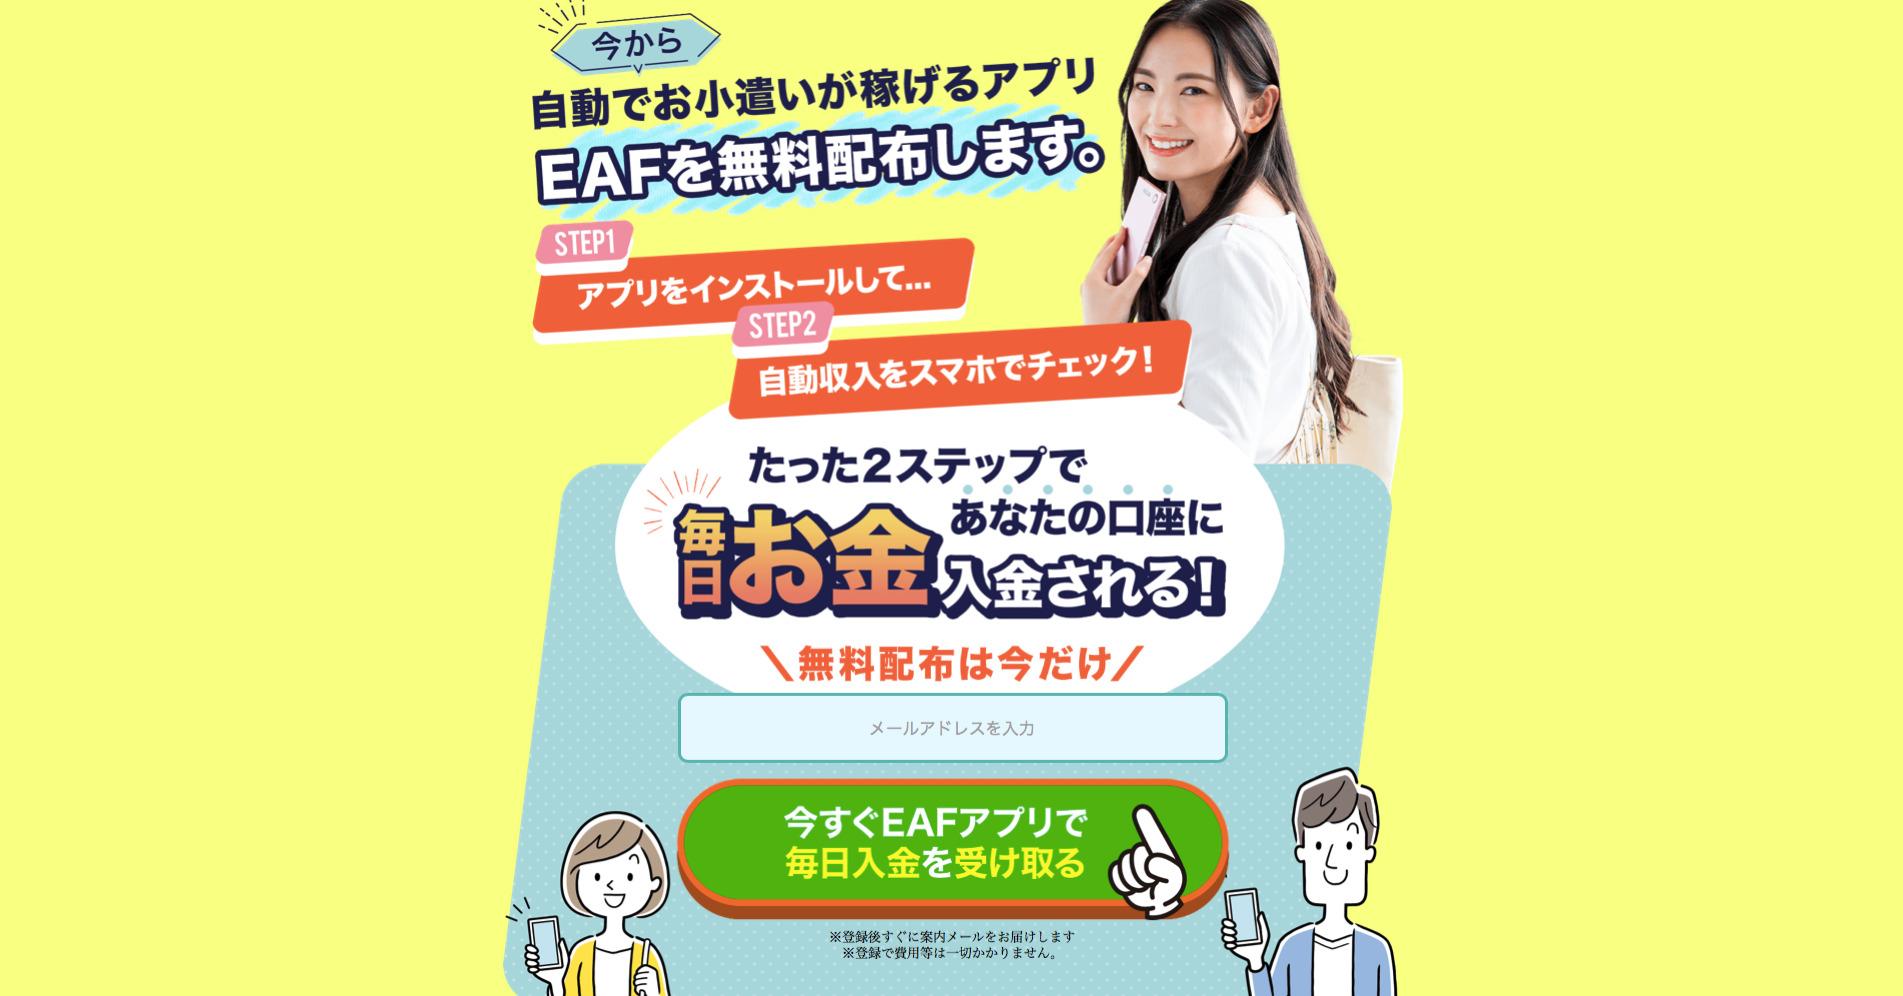 EALP1-2画像